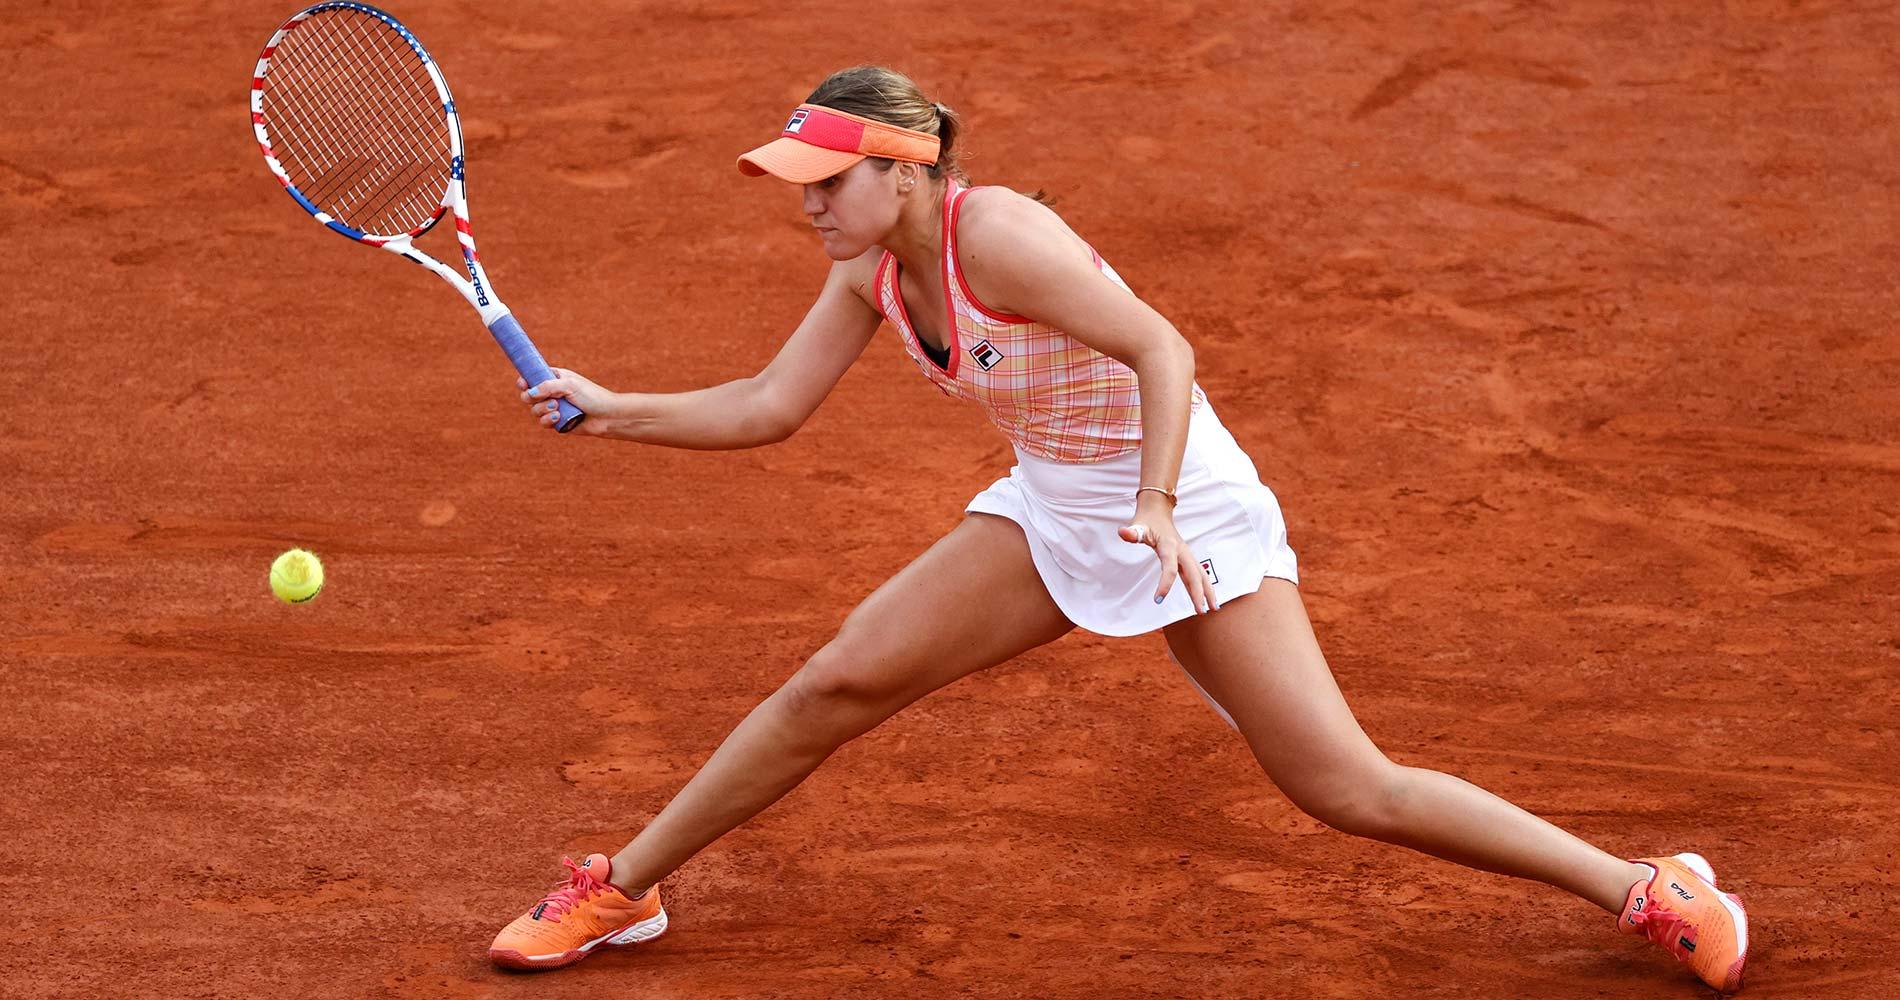 Sofia Kenin at Roland-Garros 2020 semifinal